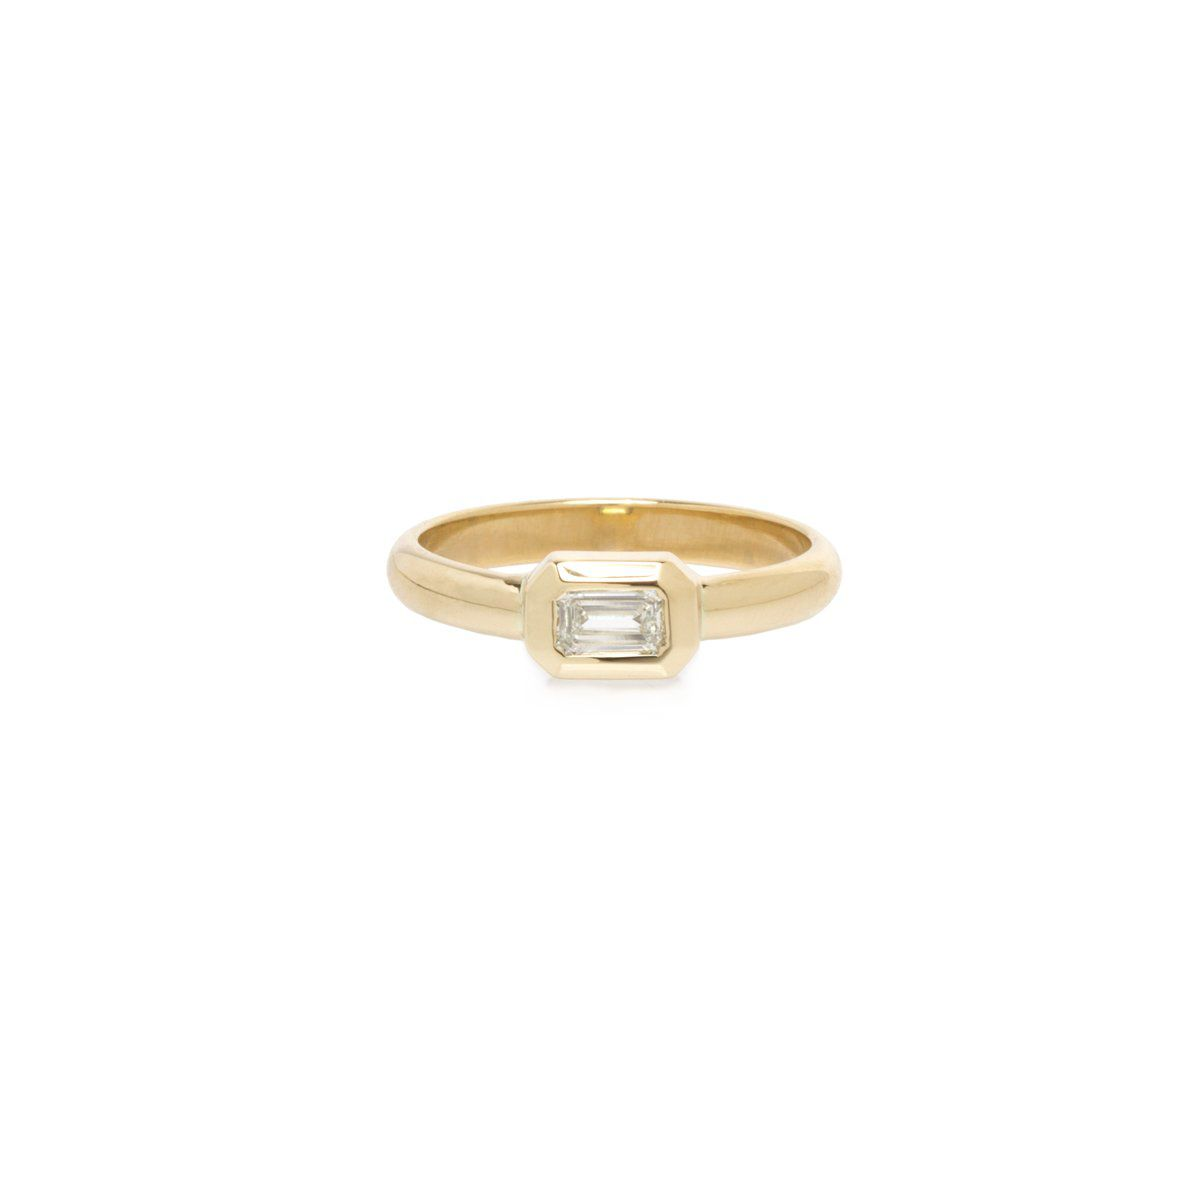 Small bezel set emerald cut engagement ring